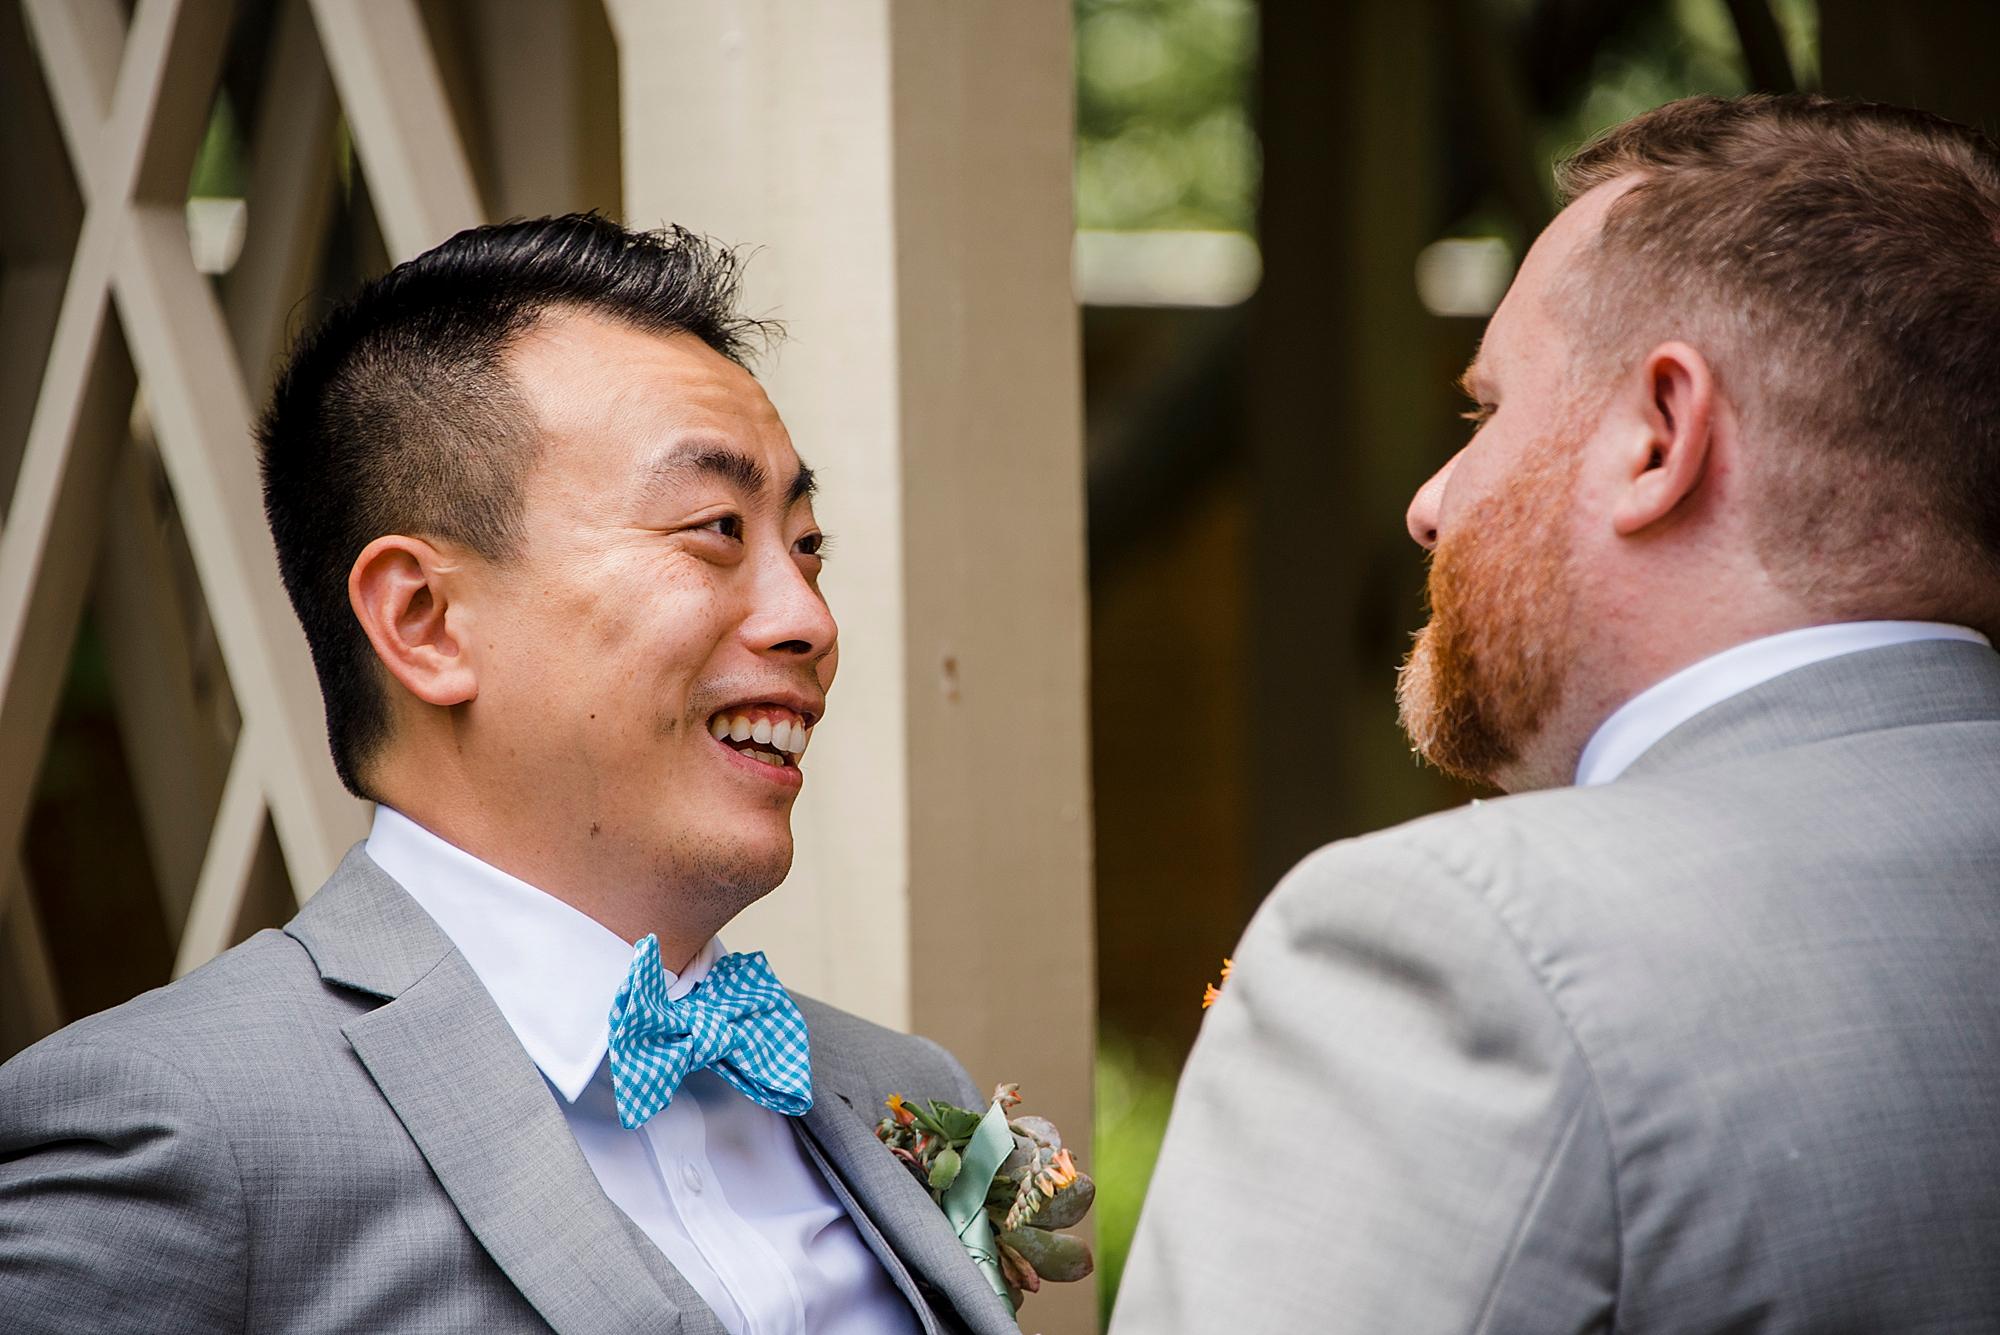 Dan_and_Byron_Love_by_Joe_Mac_Philadelphia_Wedding_LGBTQ_Photography_Gay_Independence_visitor_Center_30.JPG